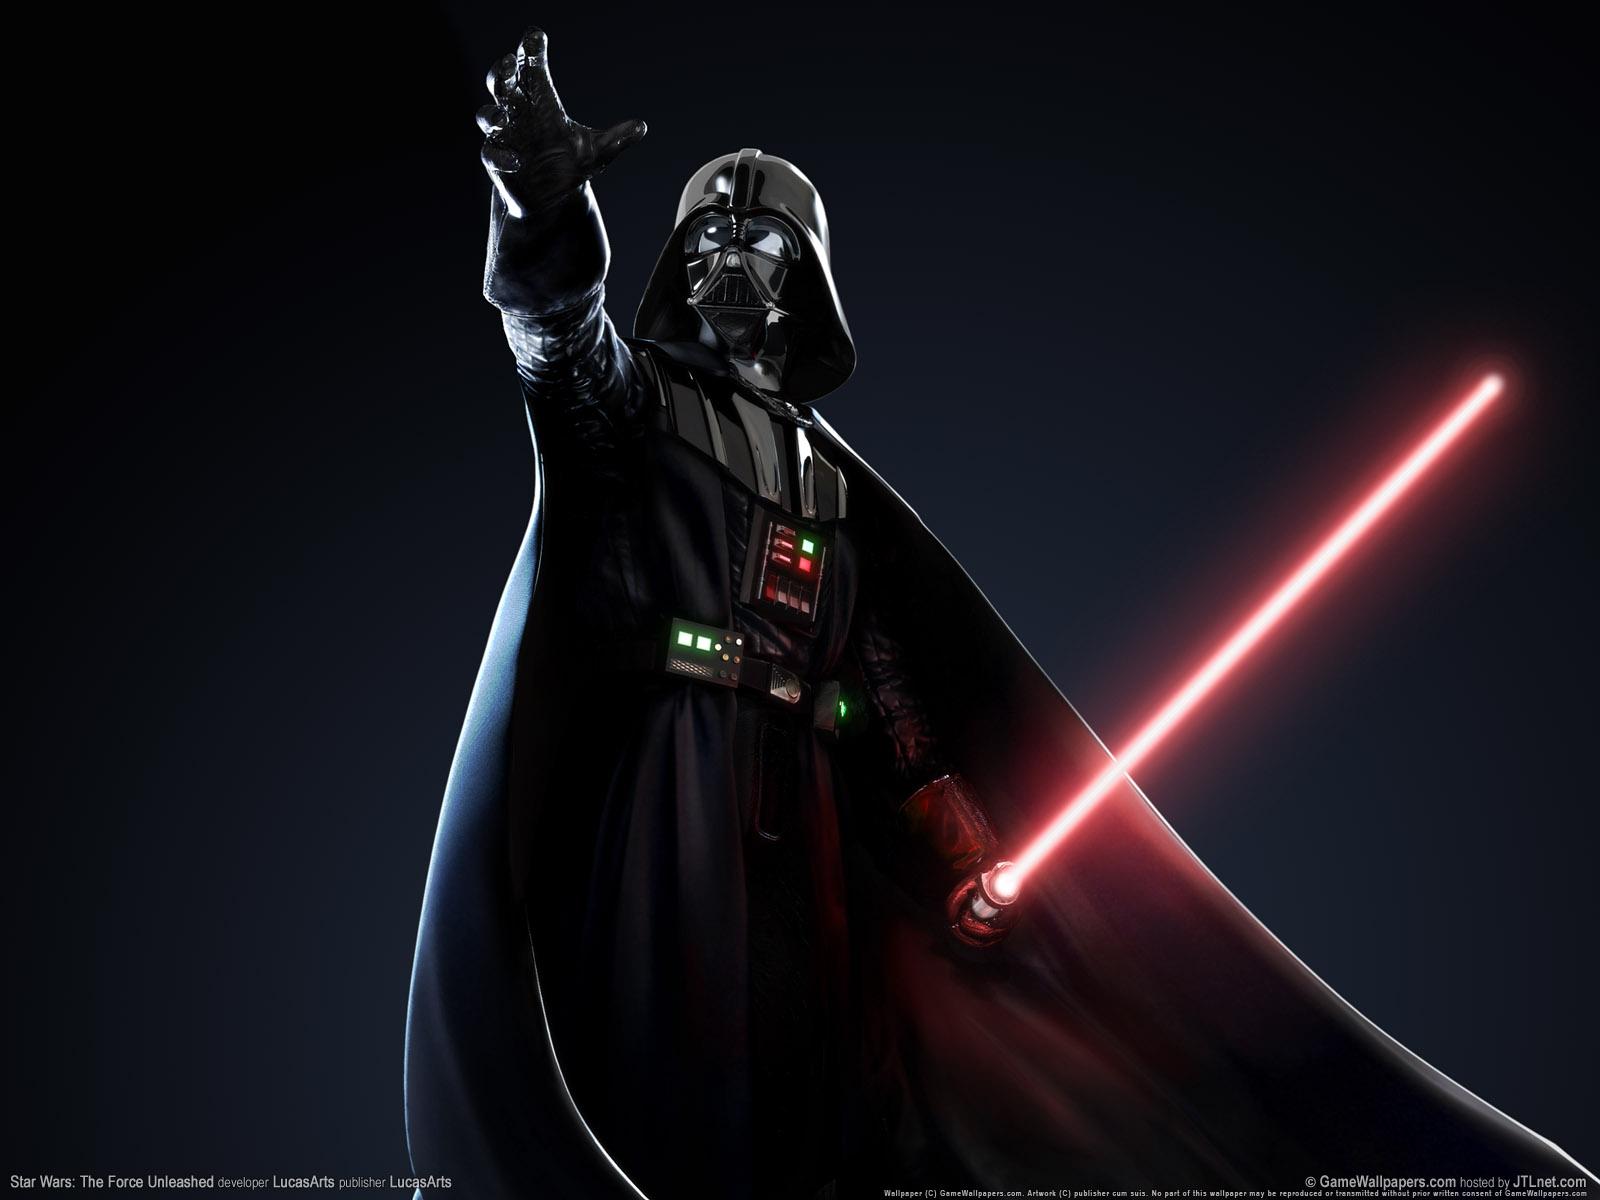 Fondos de pantalla de Star Wars HD   Taringa 1600x1200